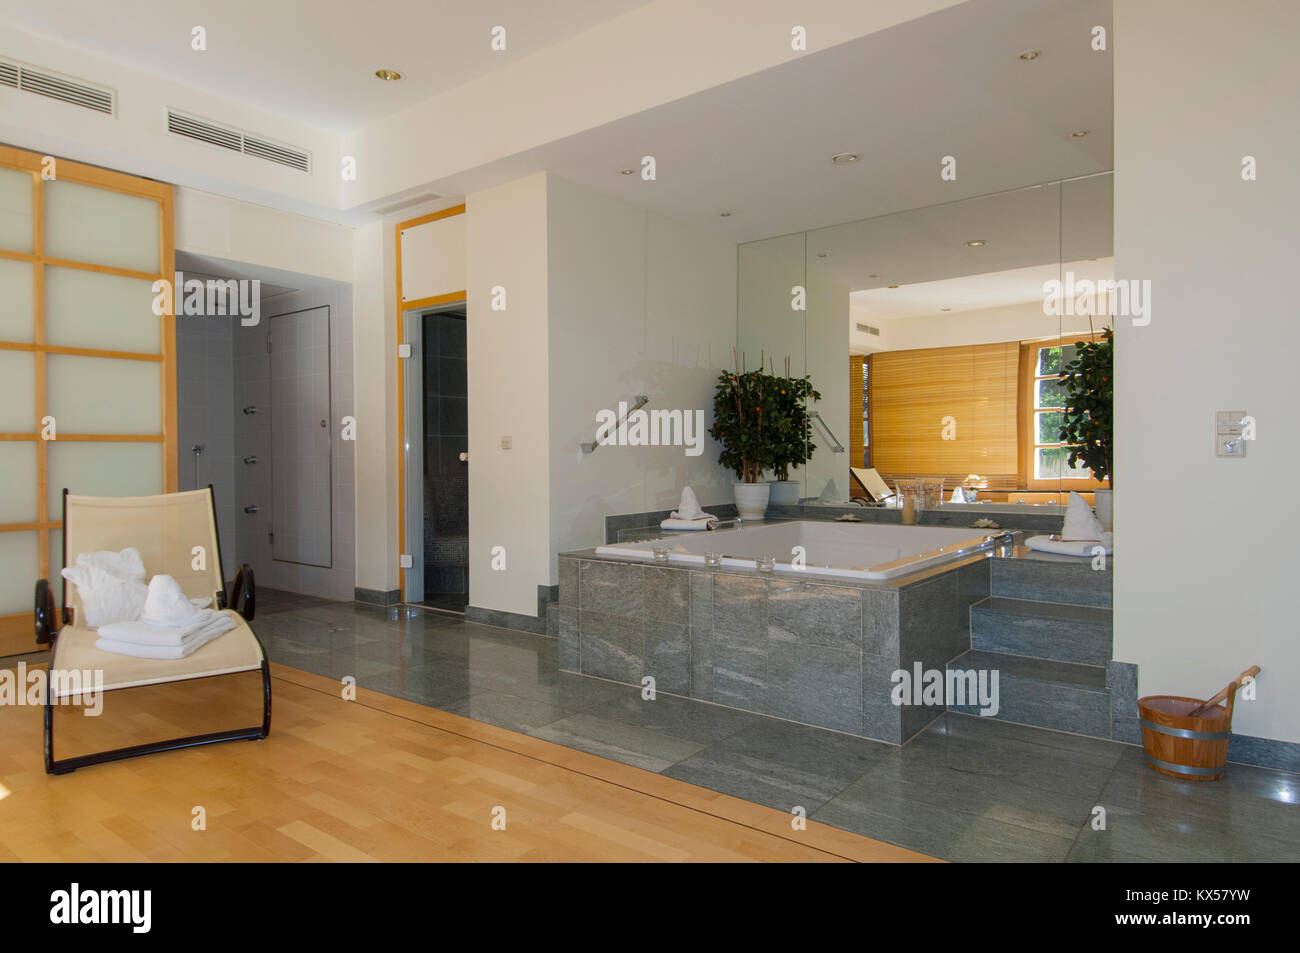 kosmetik stockfotos kosmetik bilder alamy. Black Bedroom Furniture Sets. Home Design Ideas